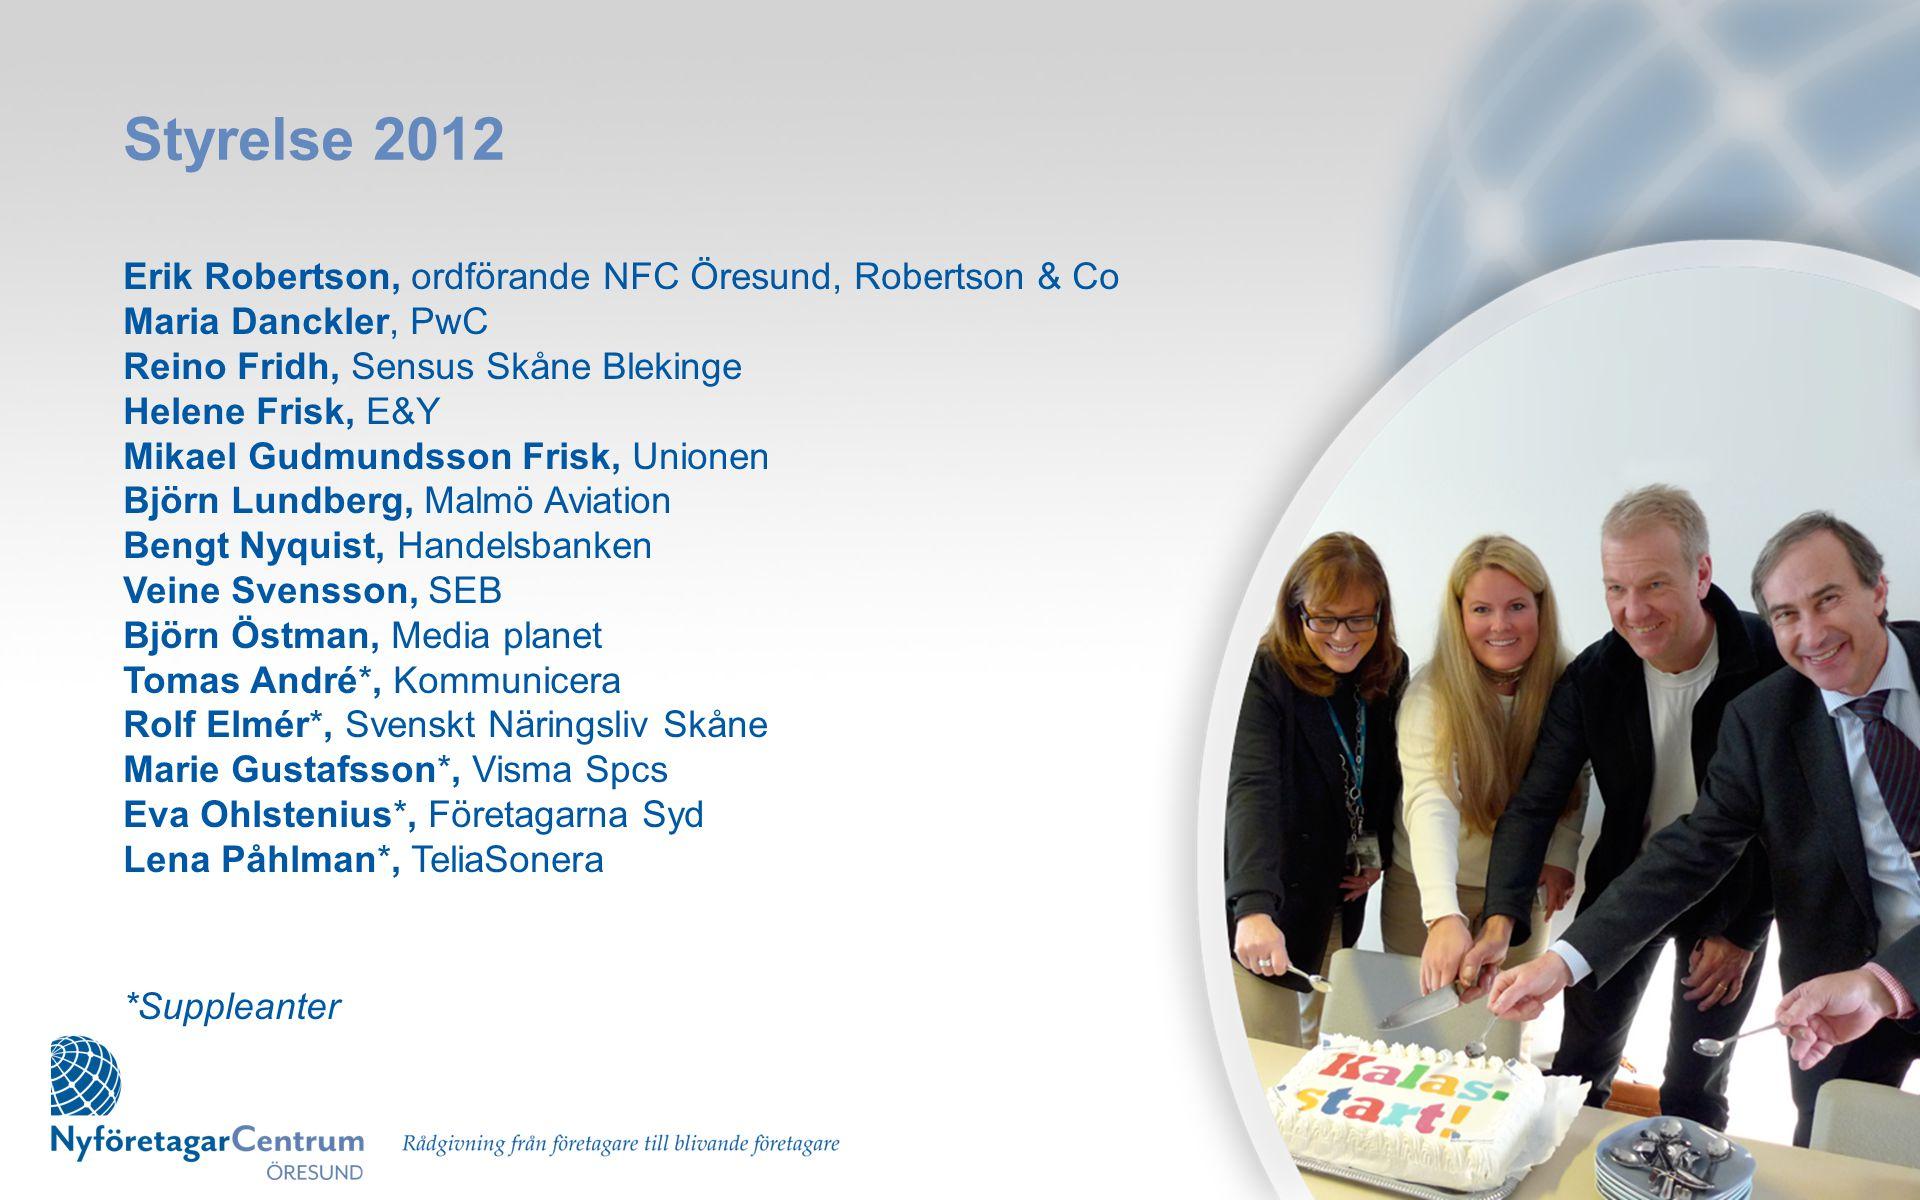 Styrelse 2012